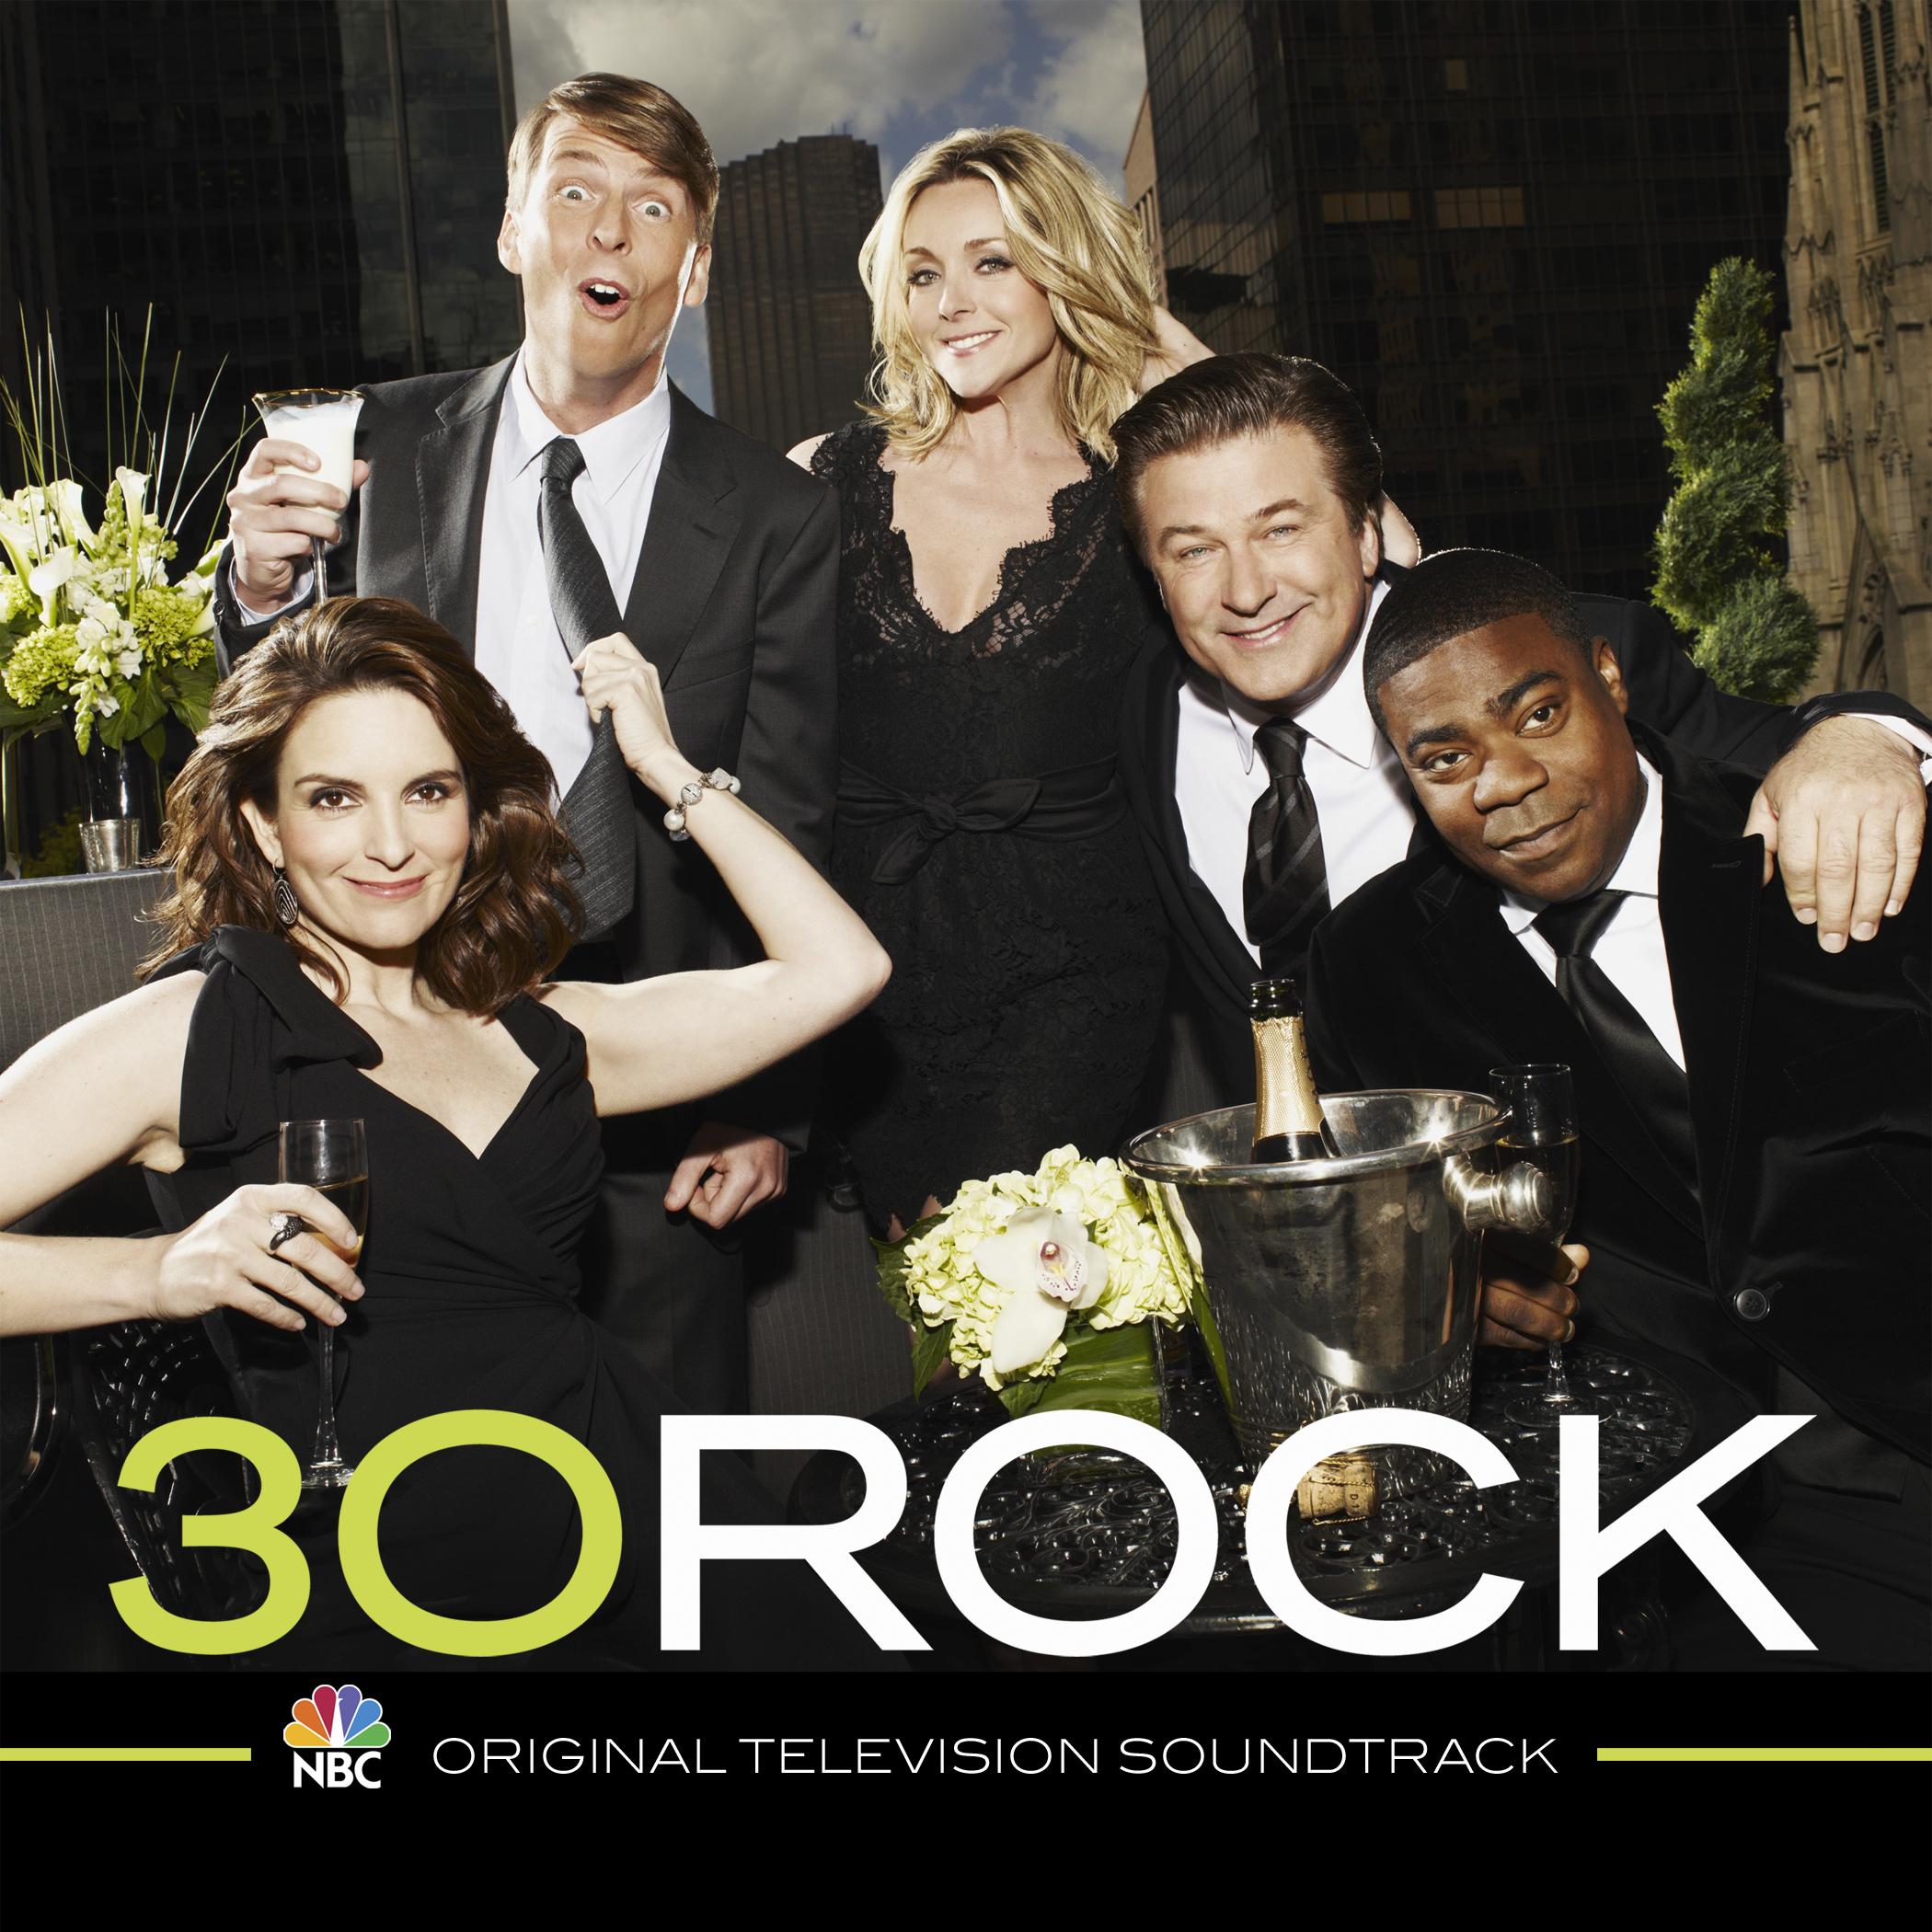 30 Rock OST